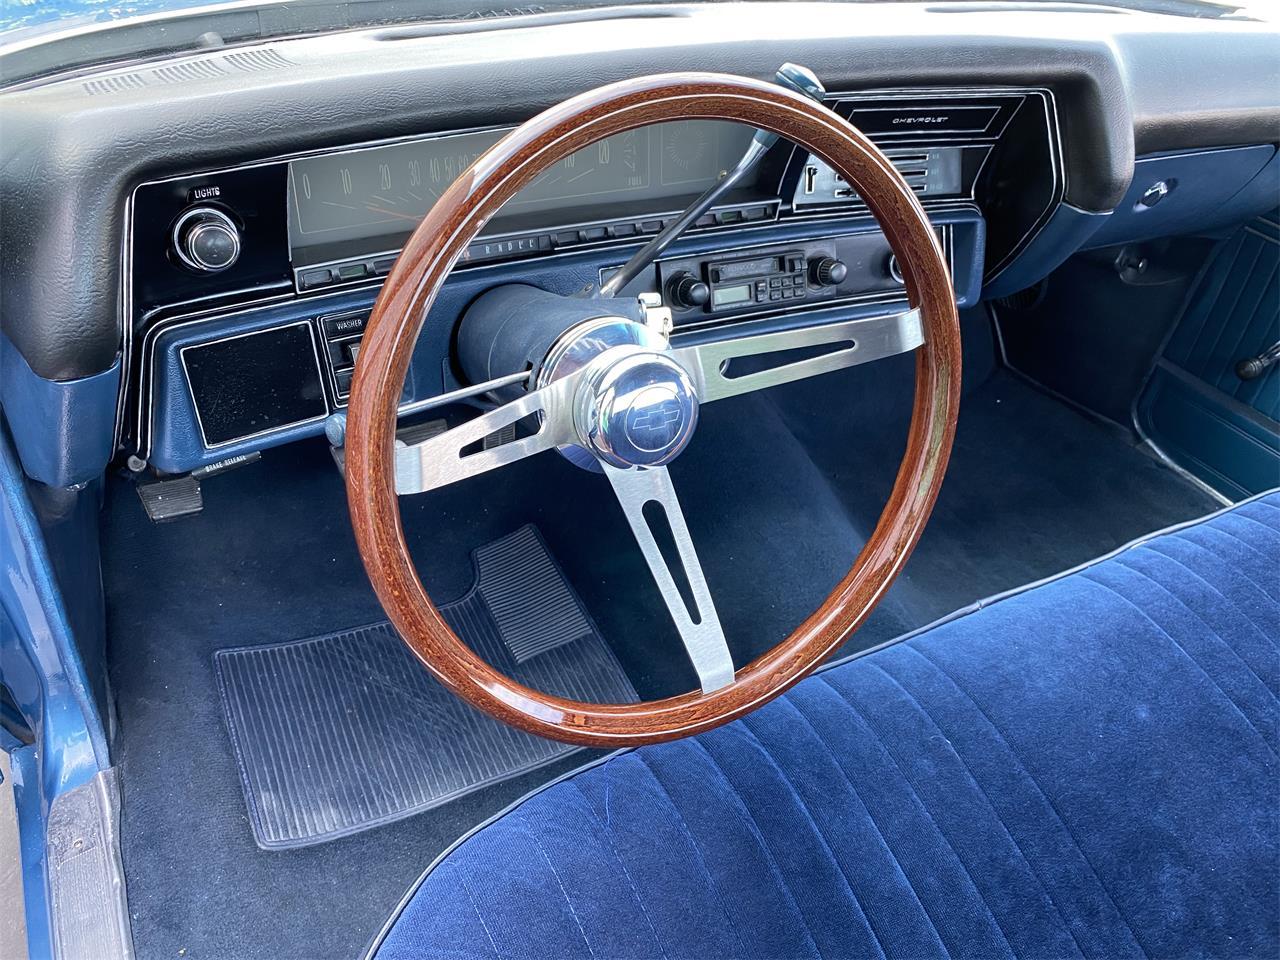 1970 Chevrolet El Camino (CC-1359760) for sale in Stanton, California